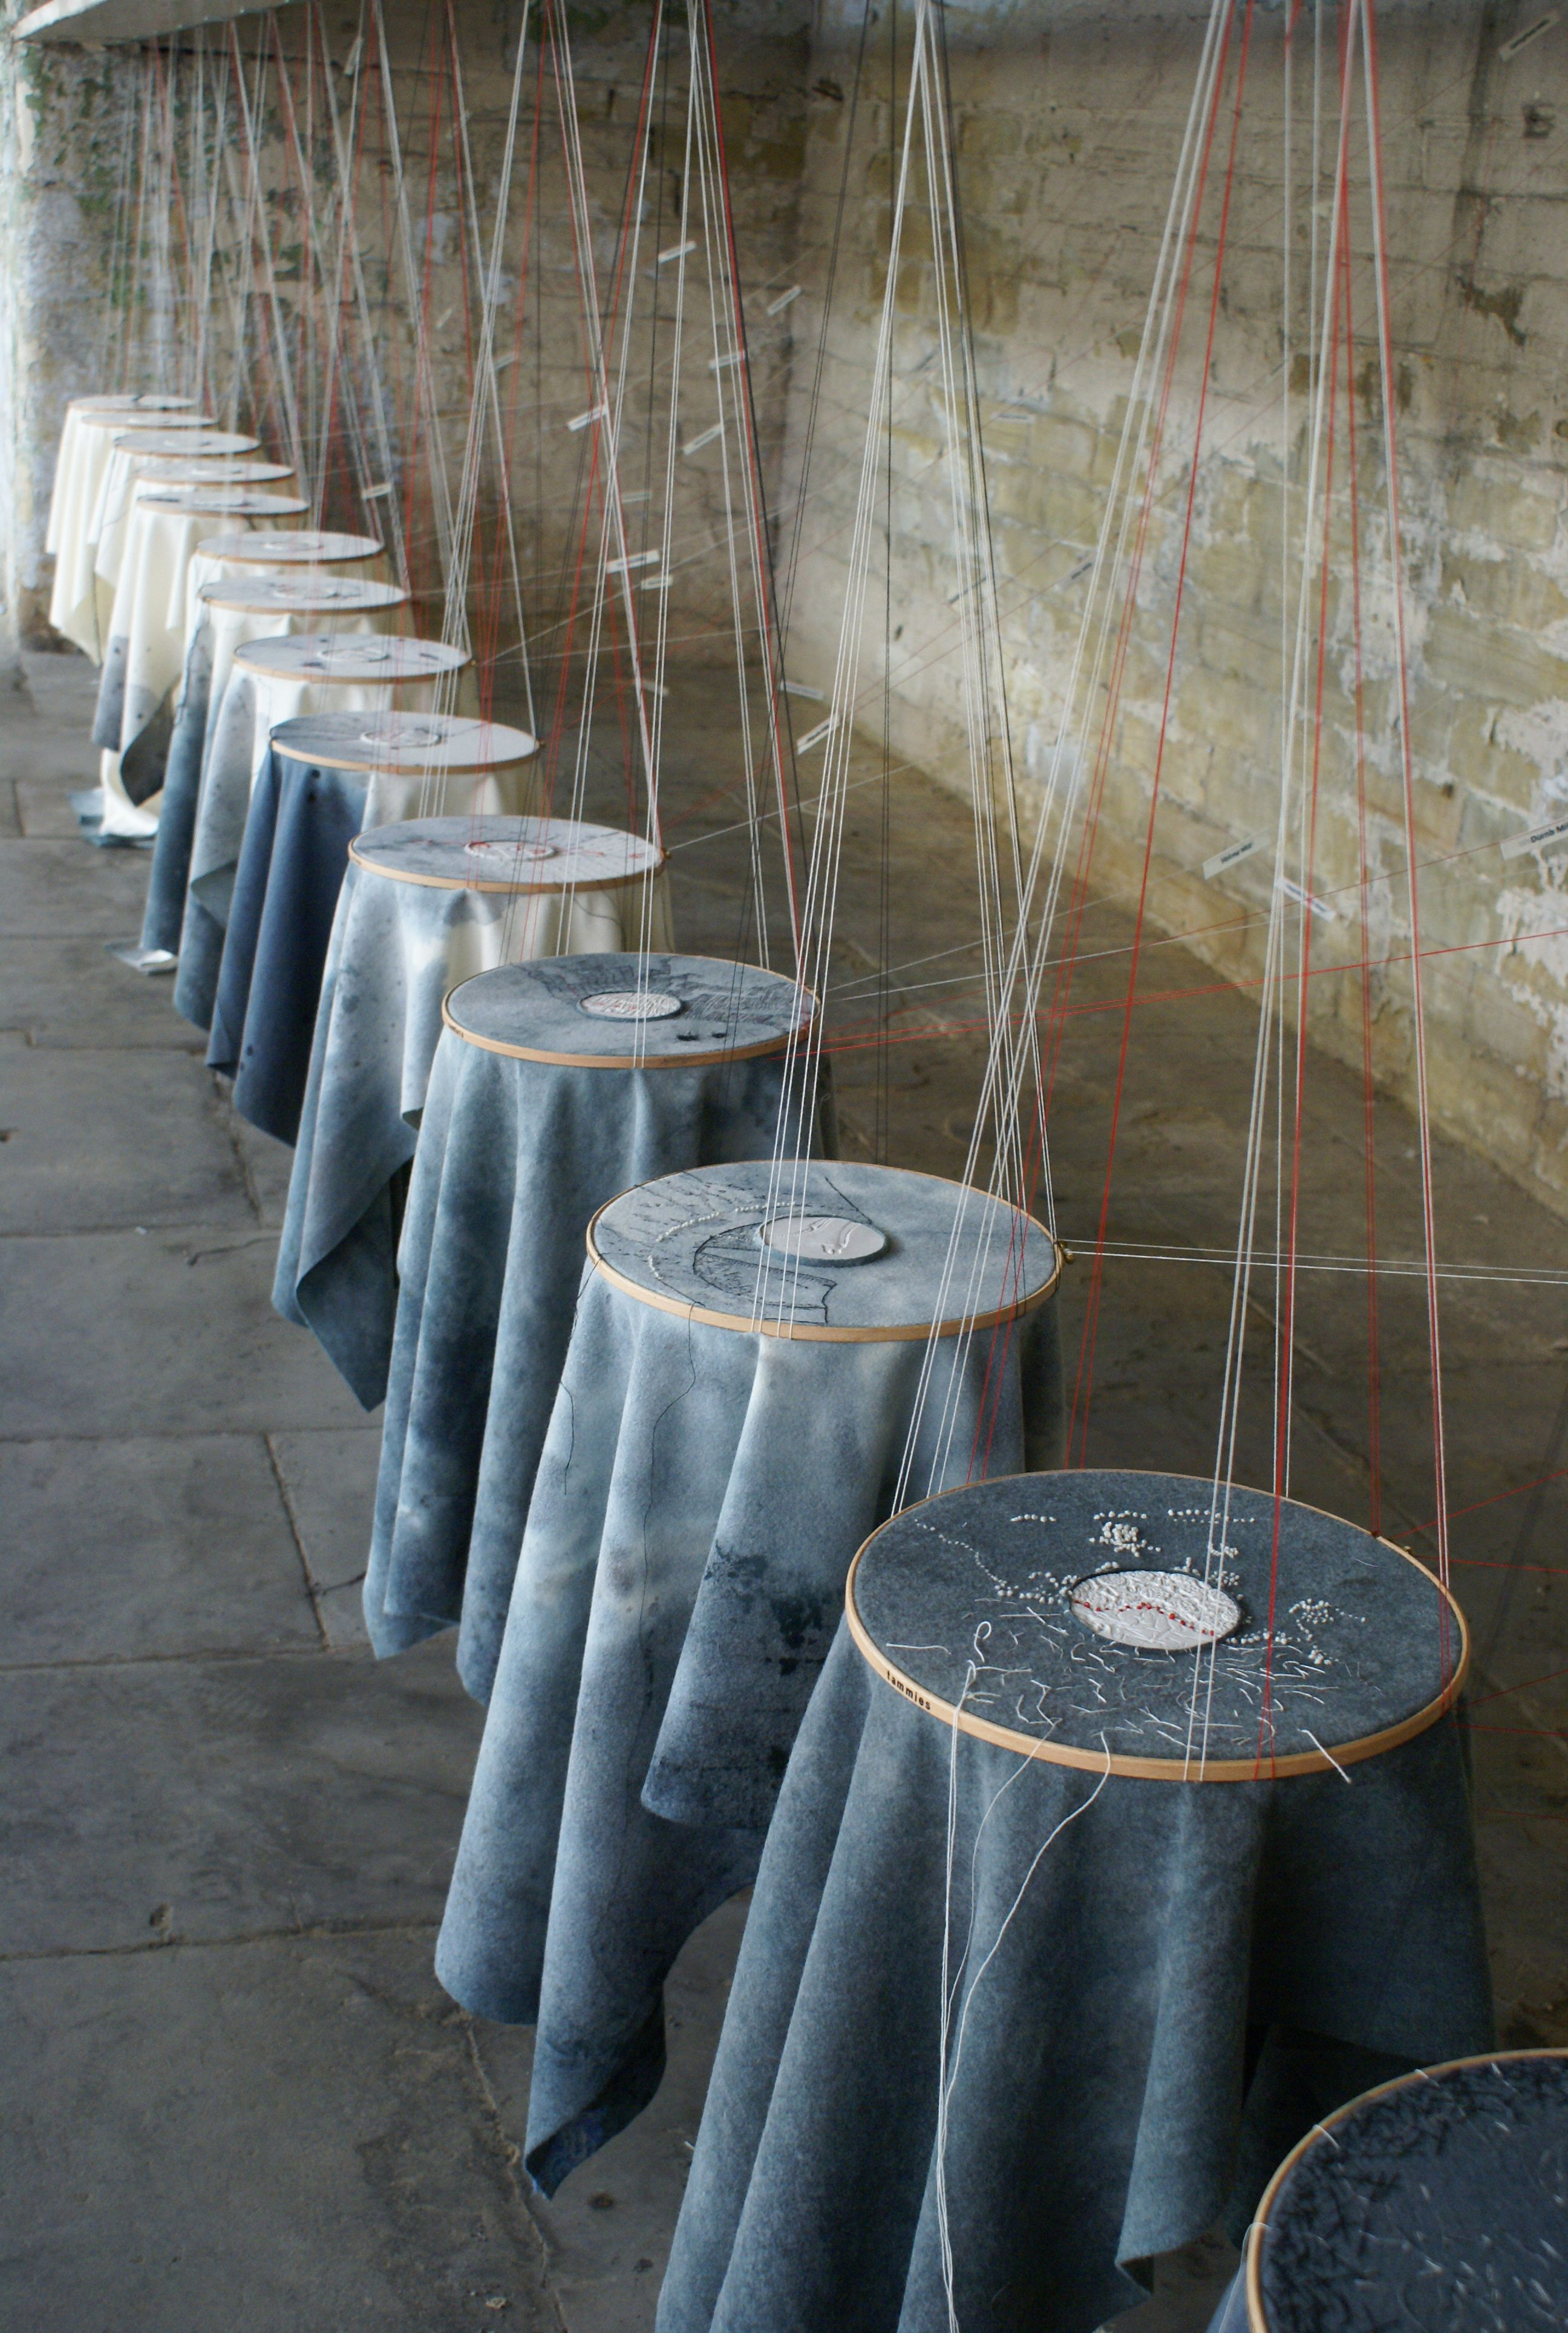 Caroline Bartlett - Stilled 1 City Lit tutor. http://www.citylit.ac.uk/courses/art-%26-design/fashion-%26-textiles/textiles